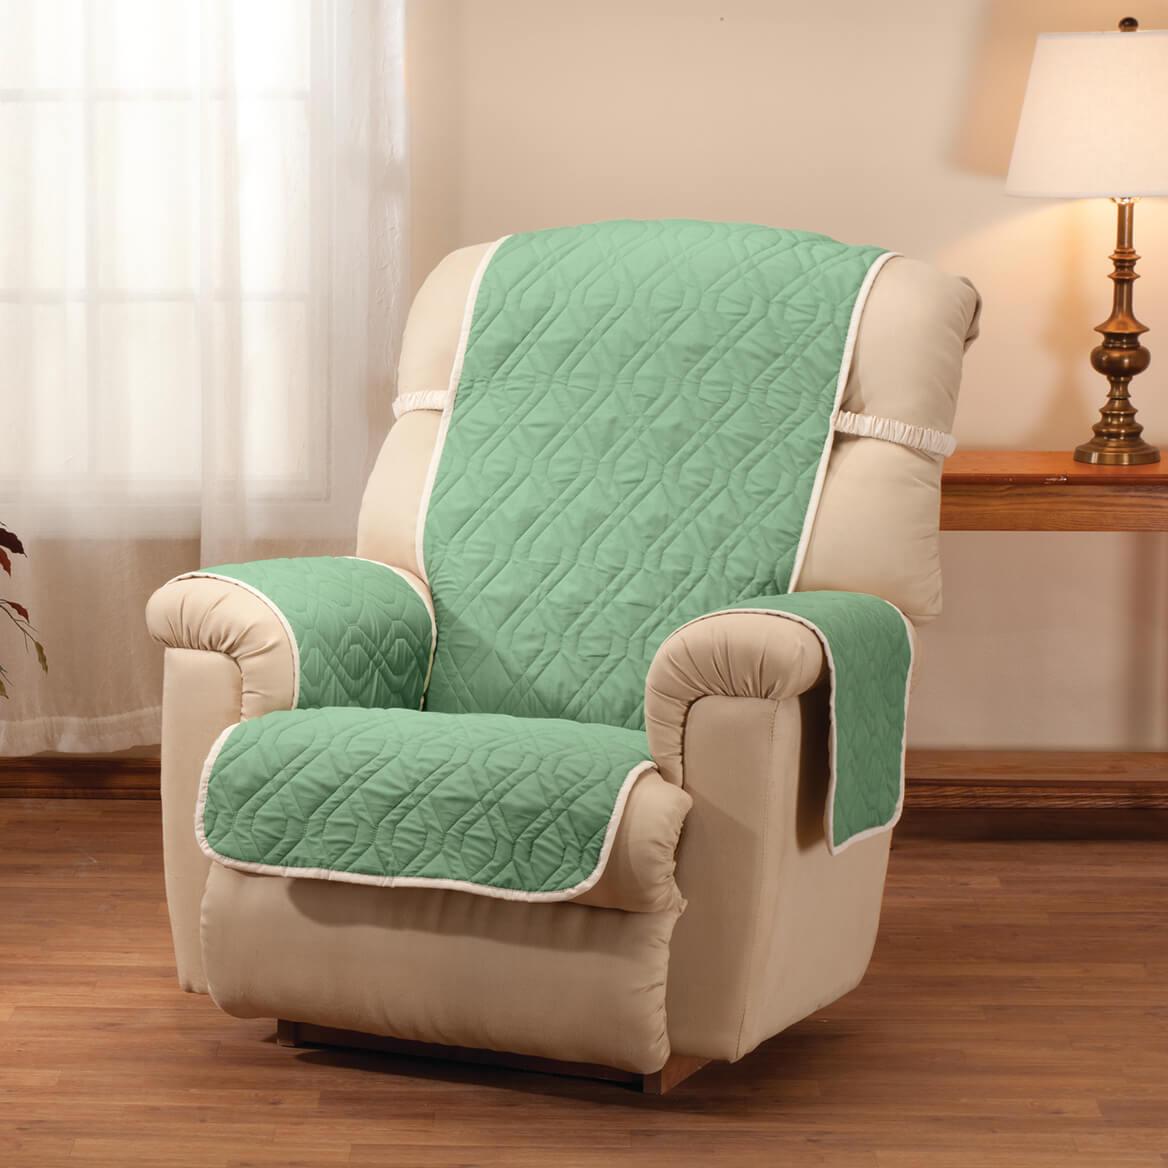 Deluxe Reversible Waterproof Recliner Chair Cover Miles